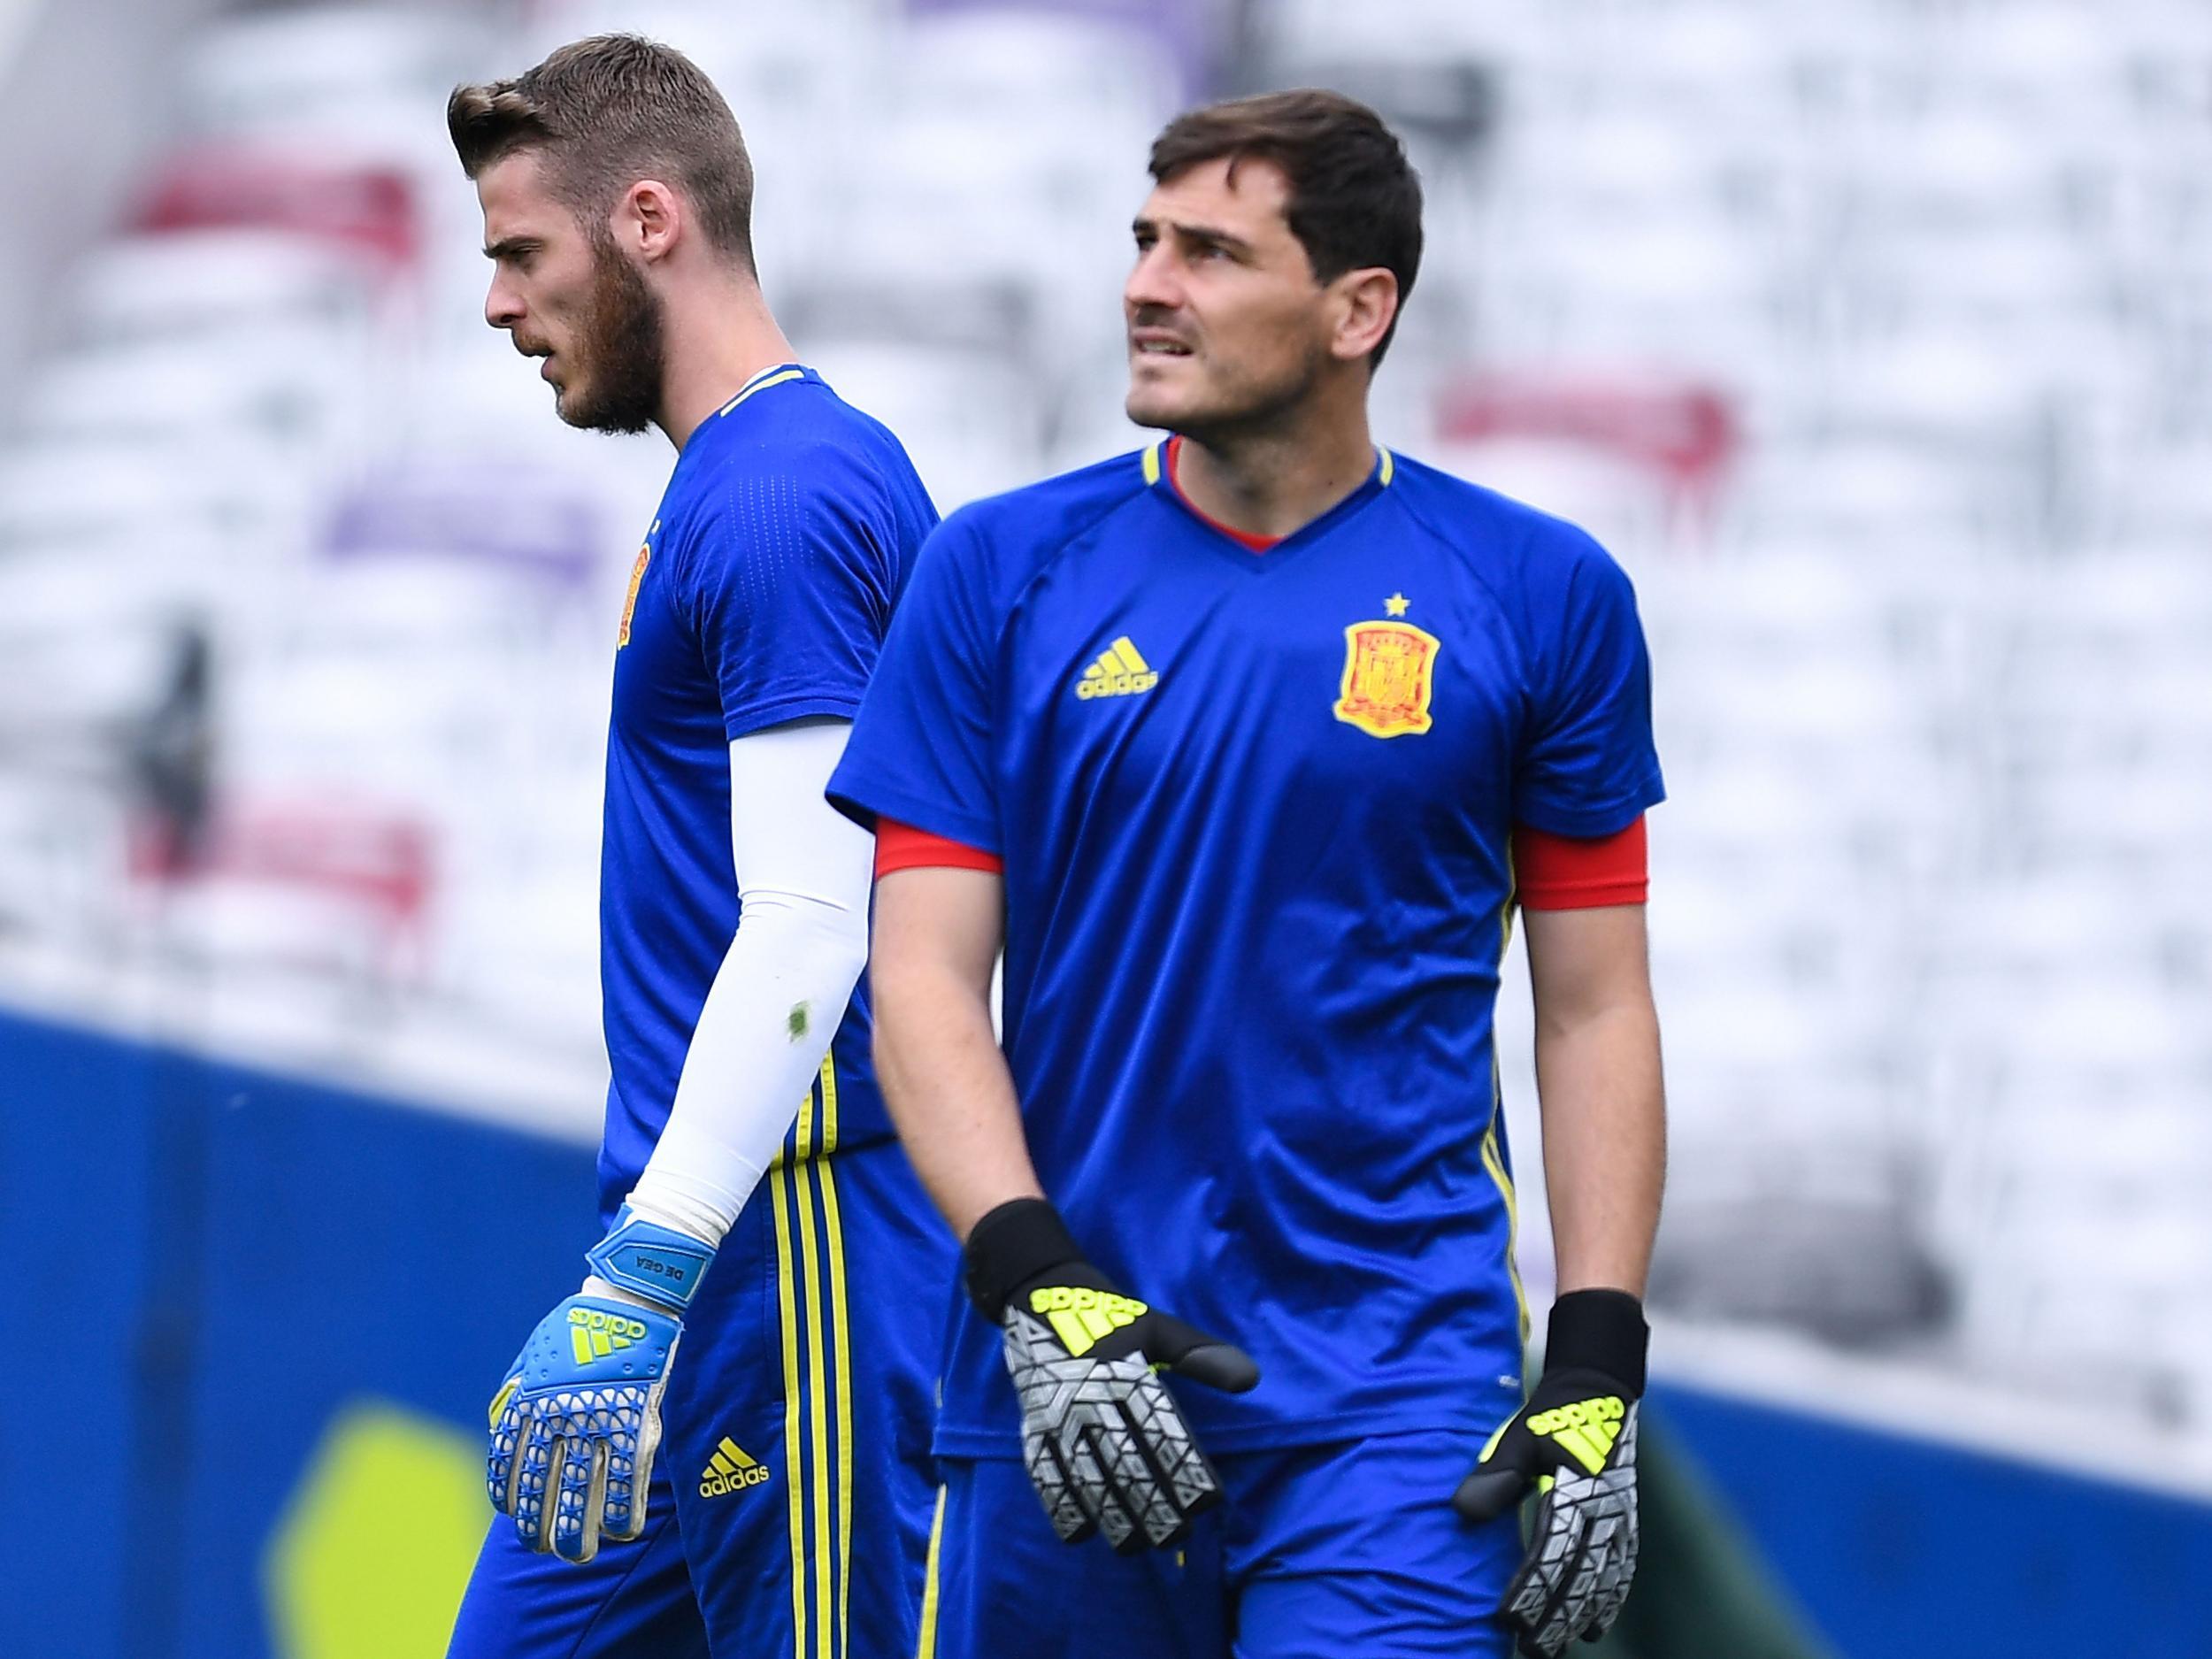 Jose Mourinho suggests Iker Casillas' ambitions behind unfair criticism of Manchester United's David de Gea